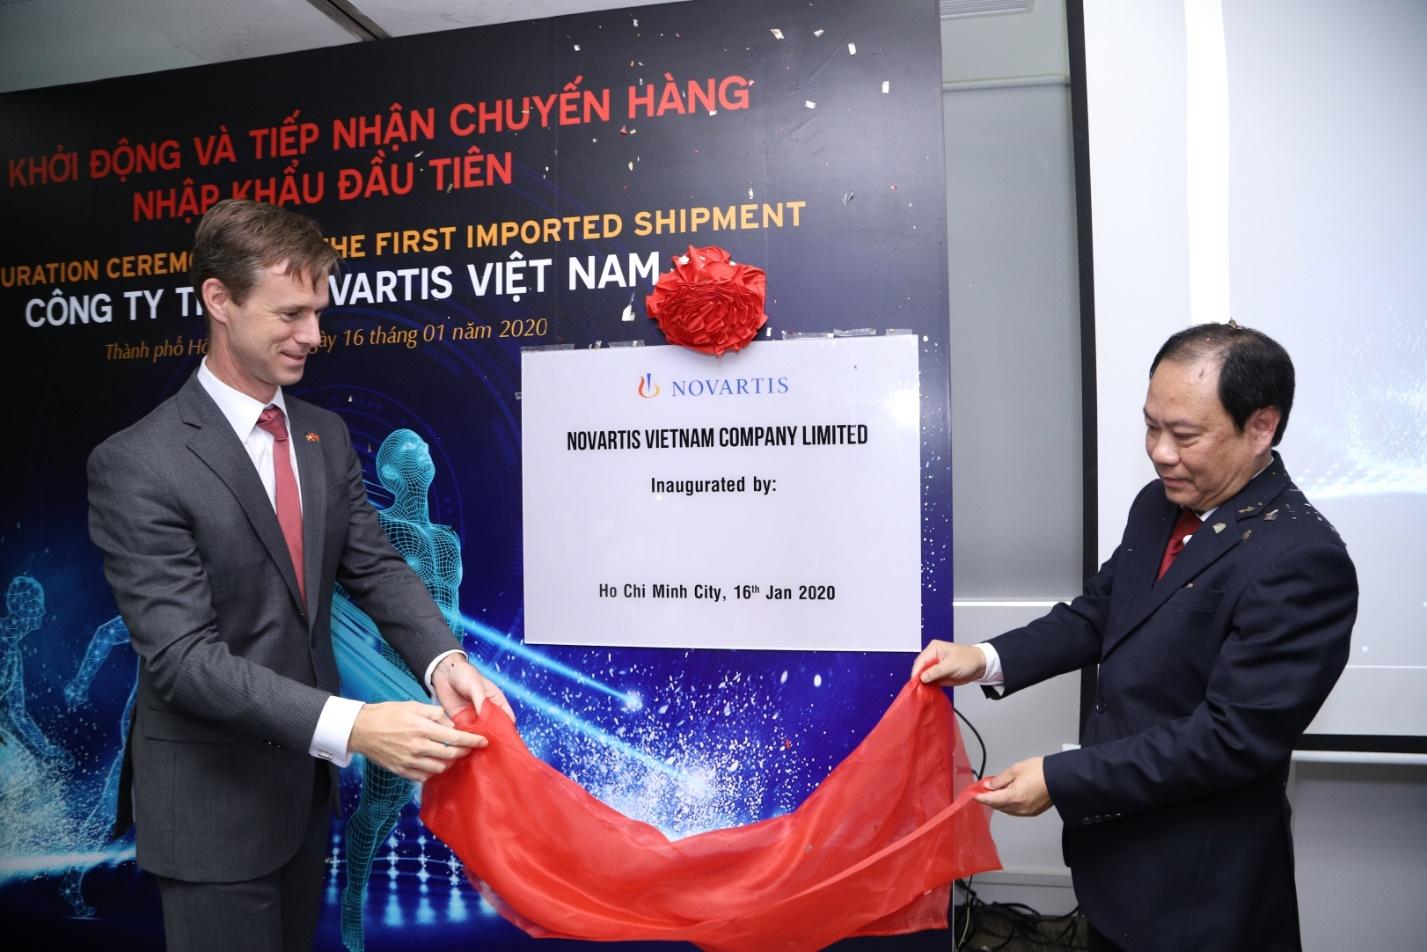 Novartis announces first import shipment, marks important milestone in transformation